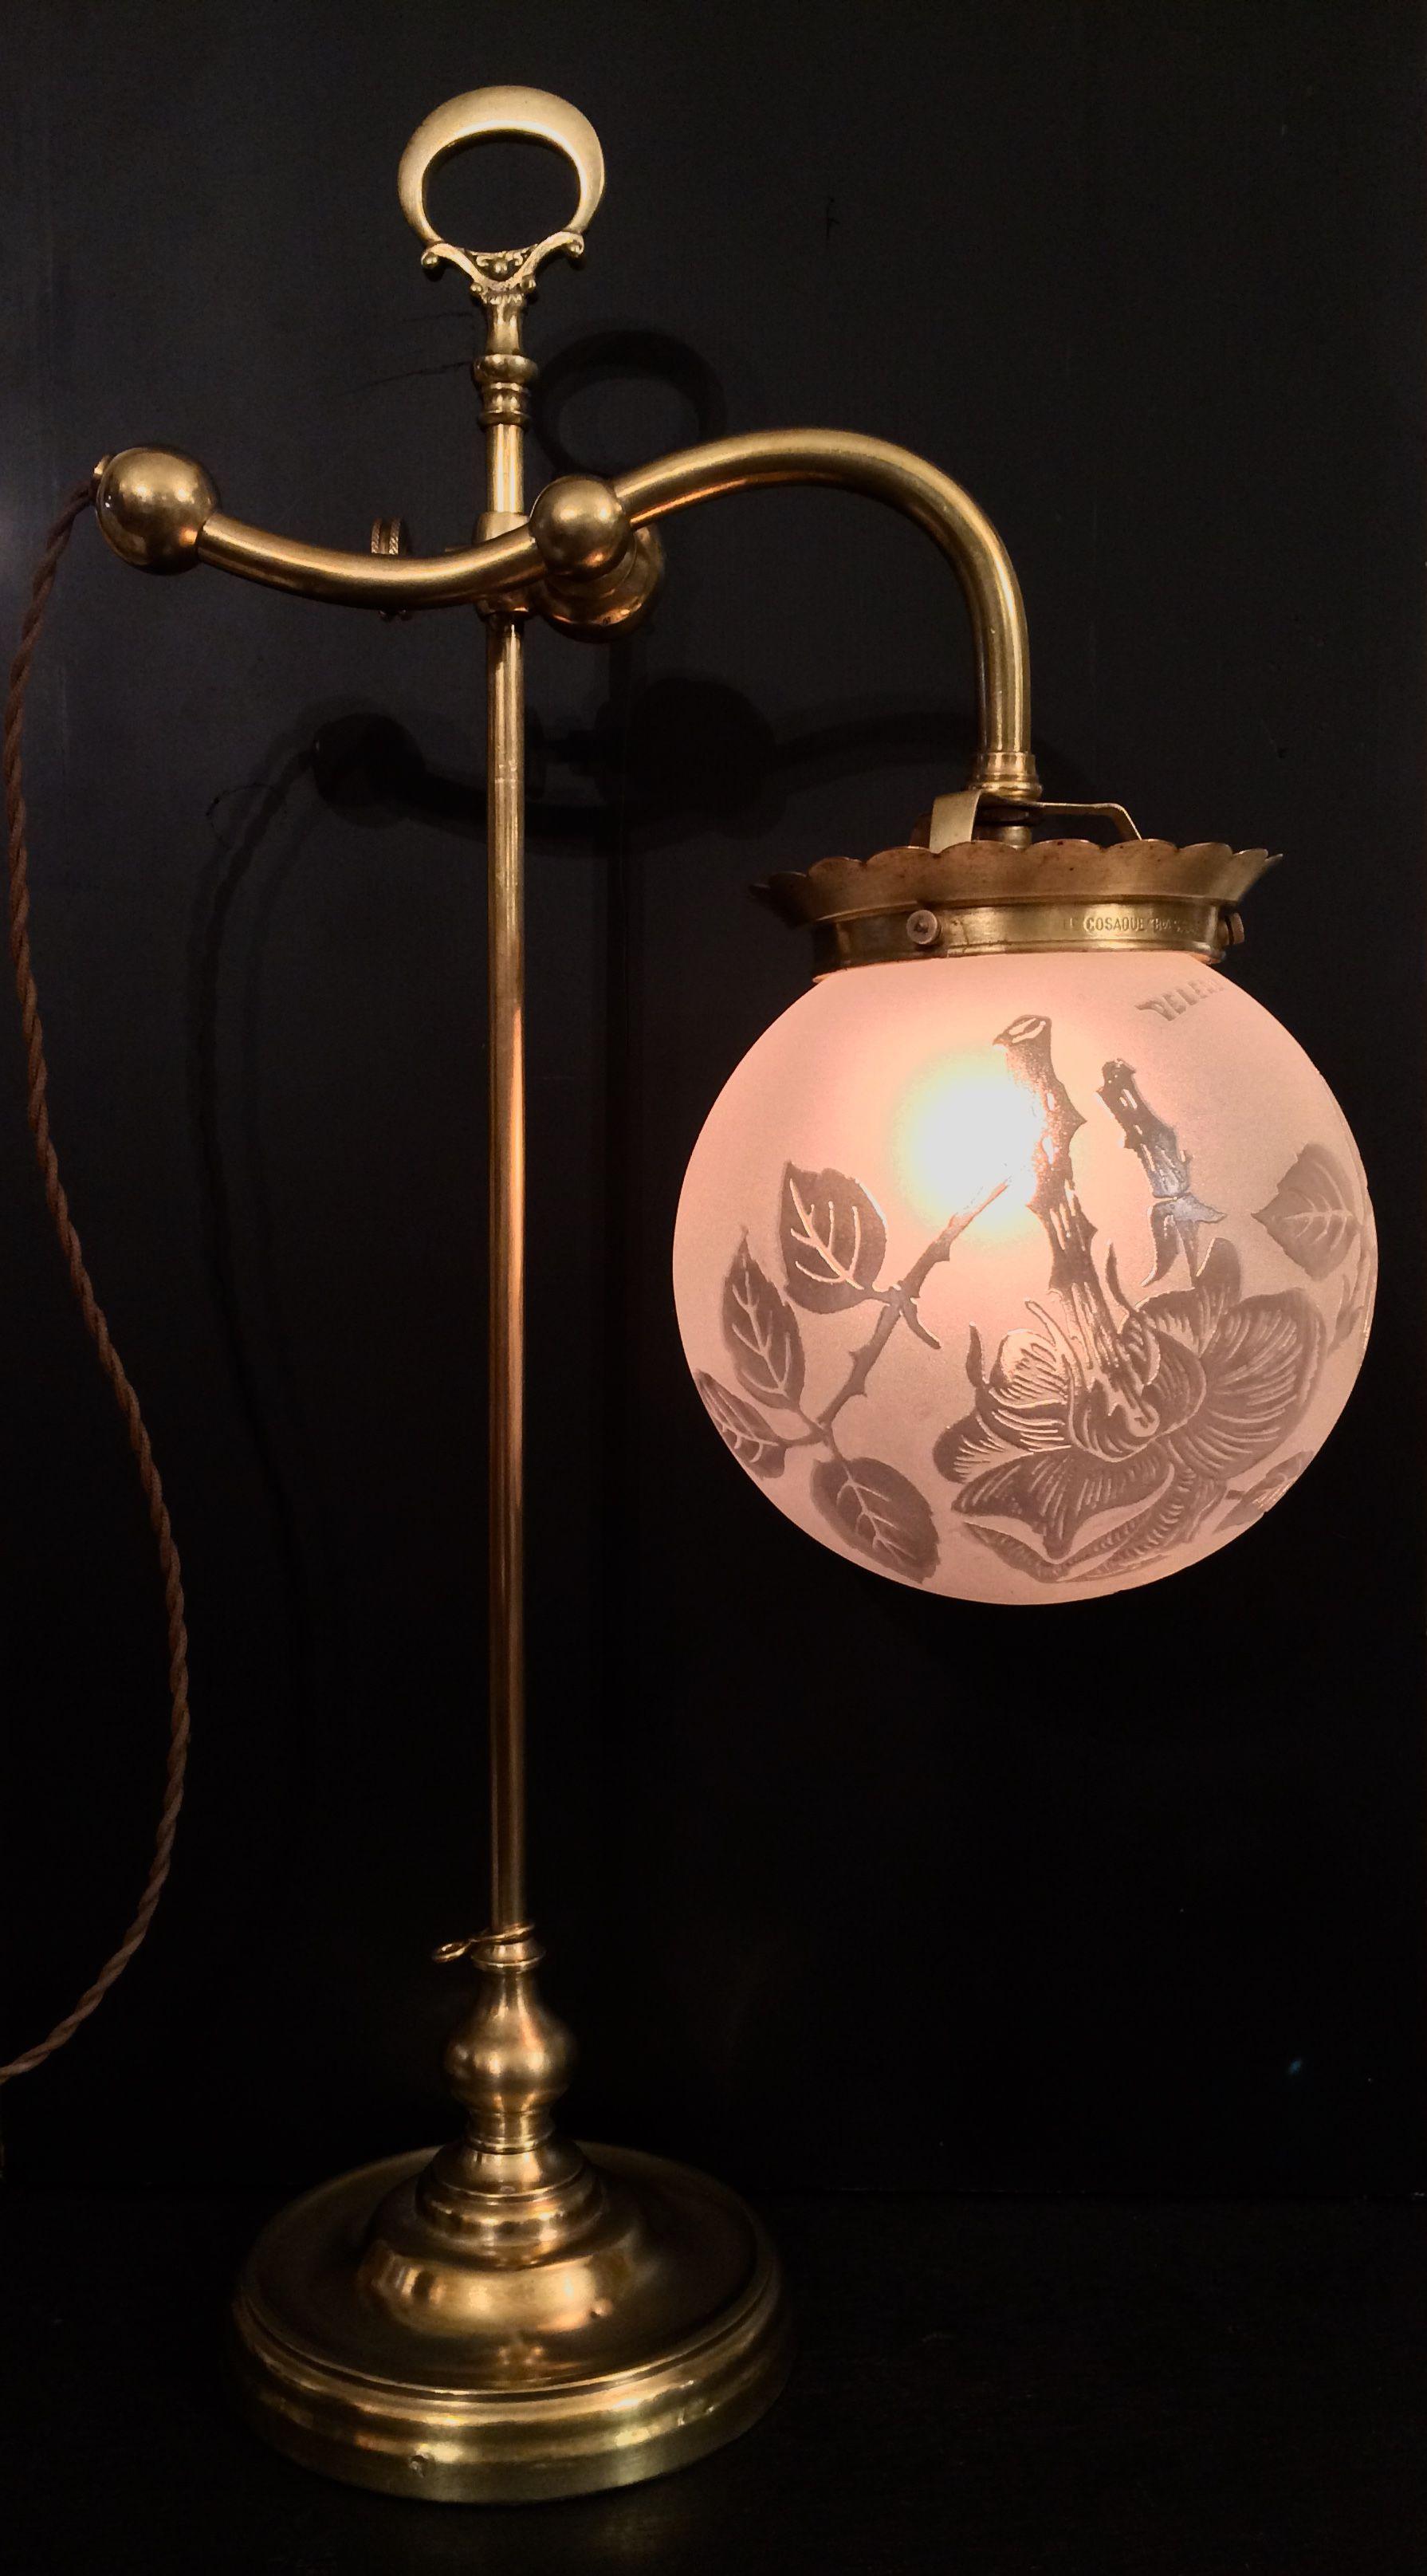 Lampe Art Deco Globe En Pate De Verre Signee Deveau 1920 1930 Retro Art Deco Art Deco Lamps Retro Art